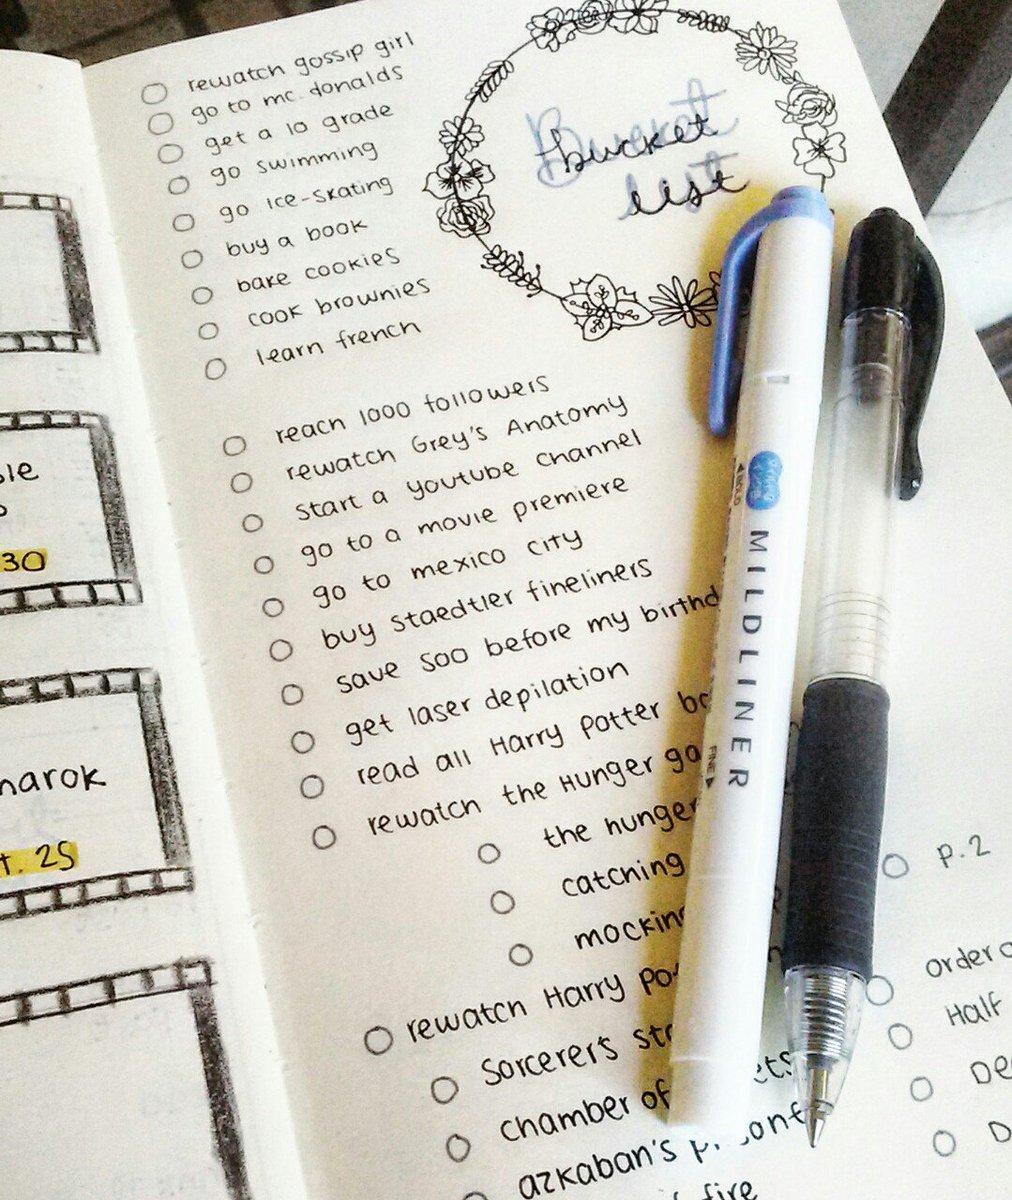 Motibate On Twitter Bulletjournal Studyblr Studyspiration Studyspo Inspiration Handwriting Bucketlist Bujo Bujojunkies Mildliners Https T Co Nwjyq2migv